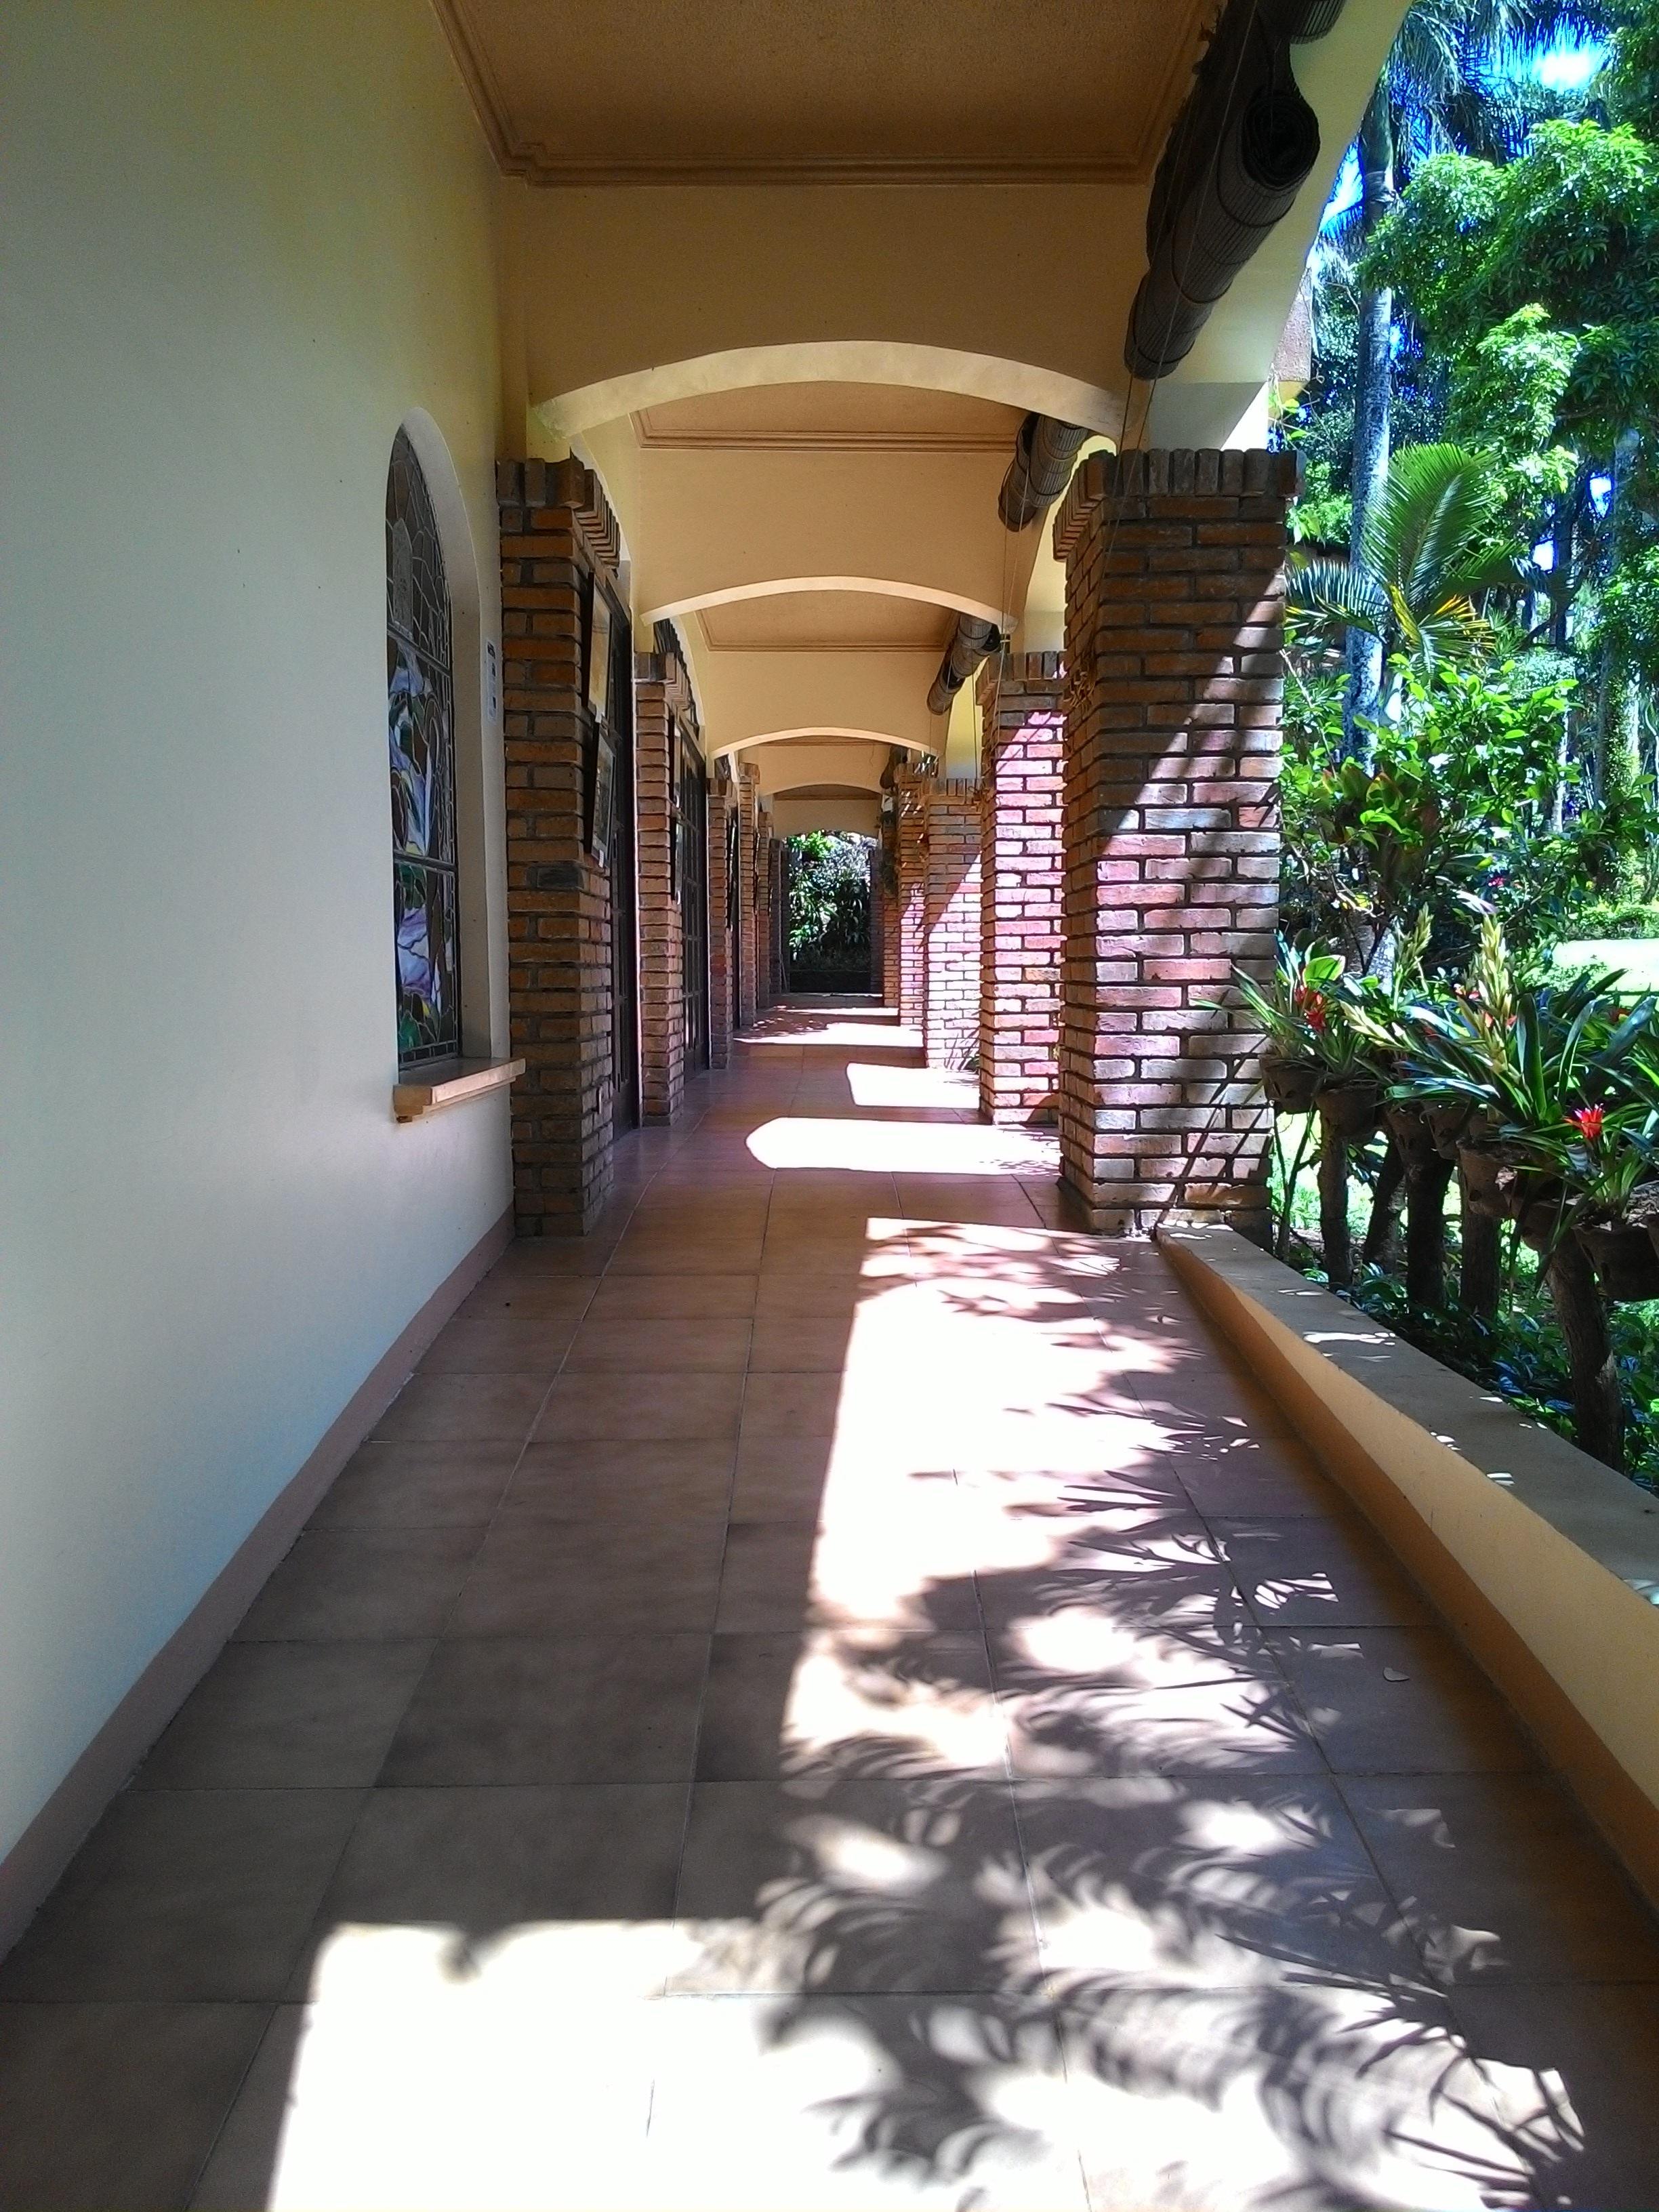 Fotos gratis arquitectura palacio casa edificio - Diseno de interiores gratis ...